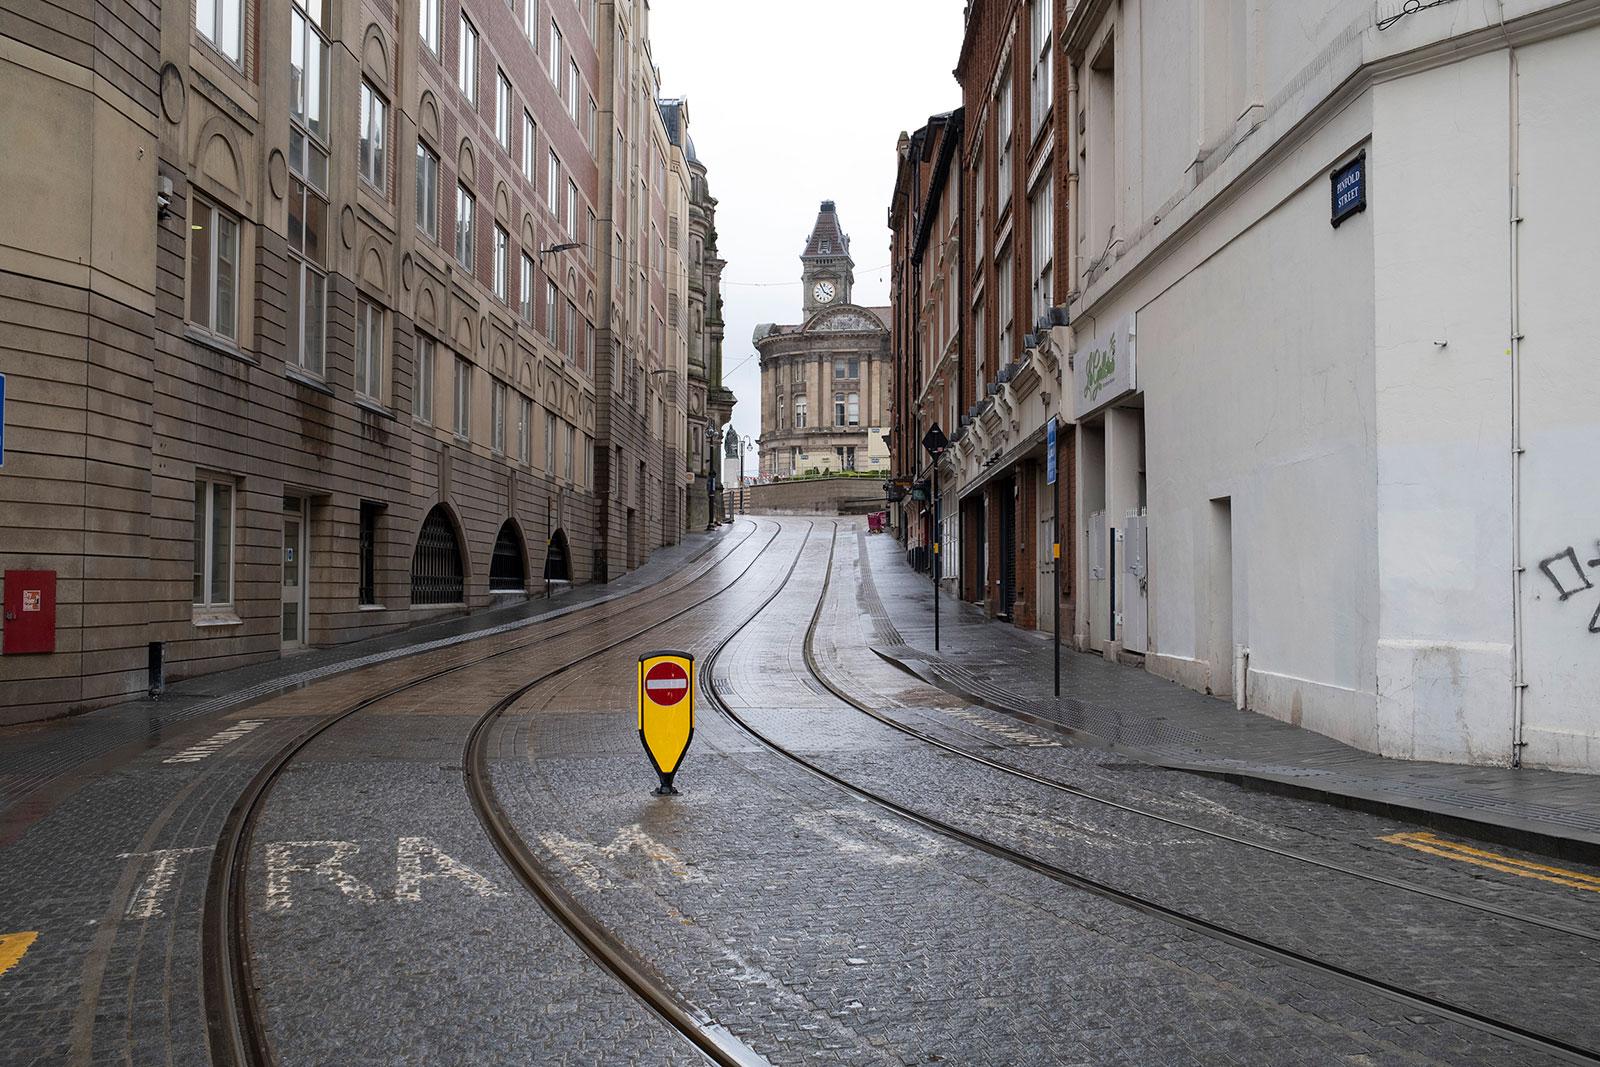 An empty street in Birmingham, England.